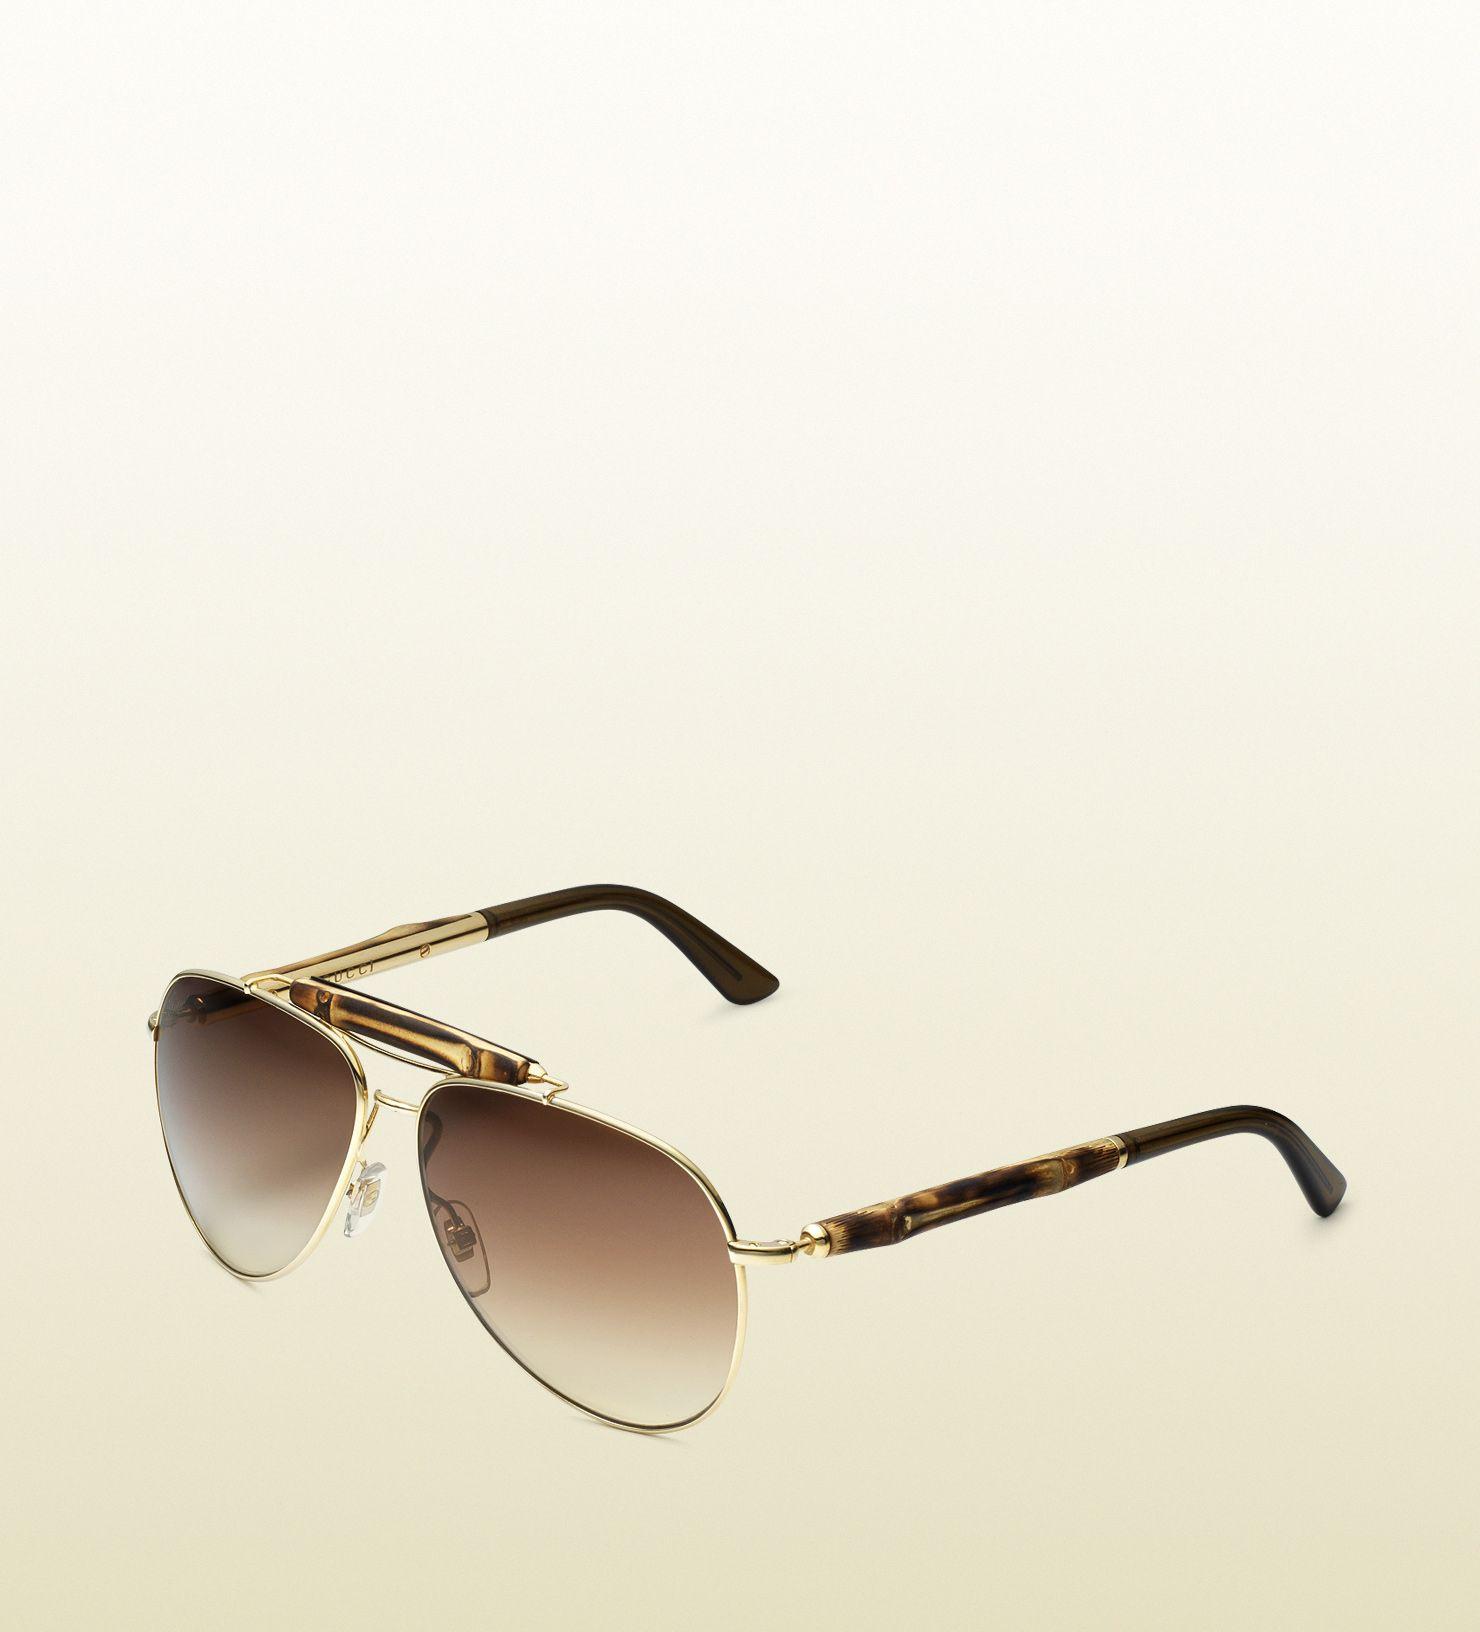 2c9dcbbeeed bamboo aviator sunglasses by Gucci